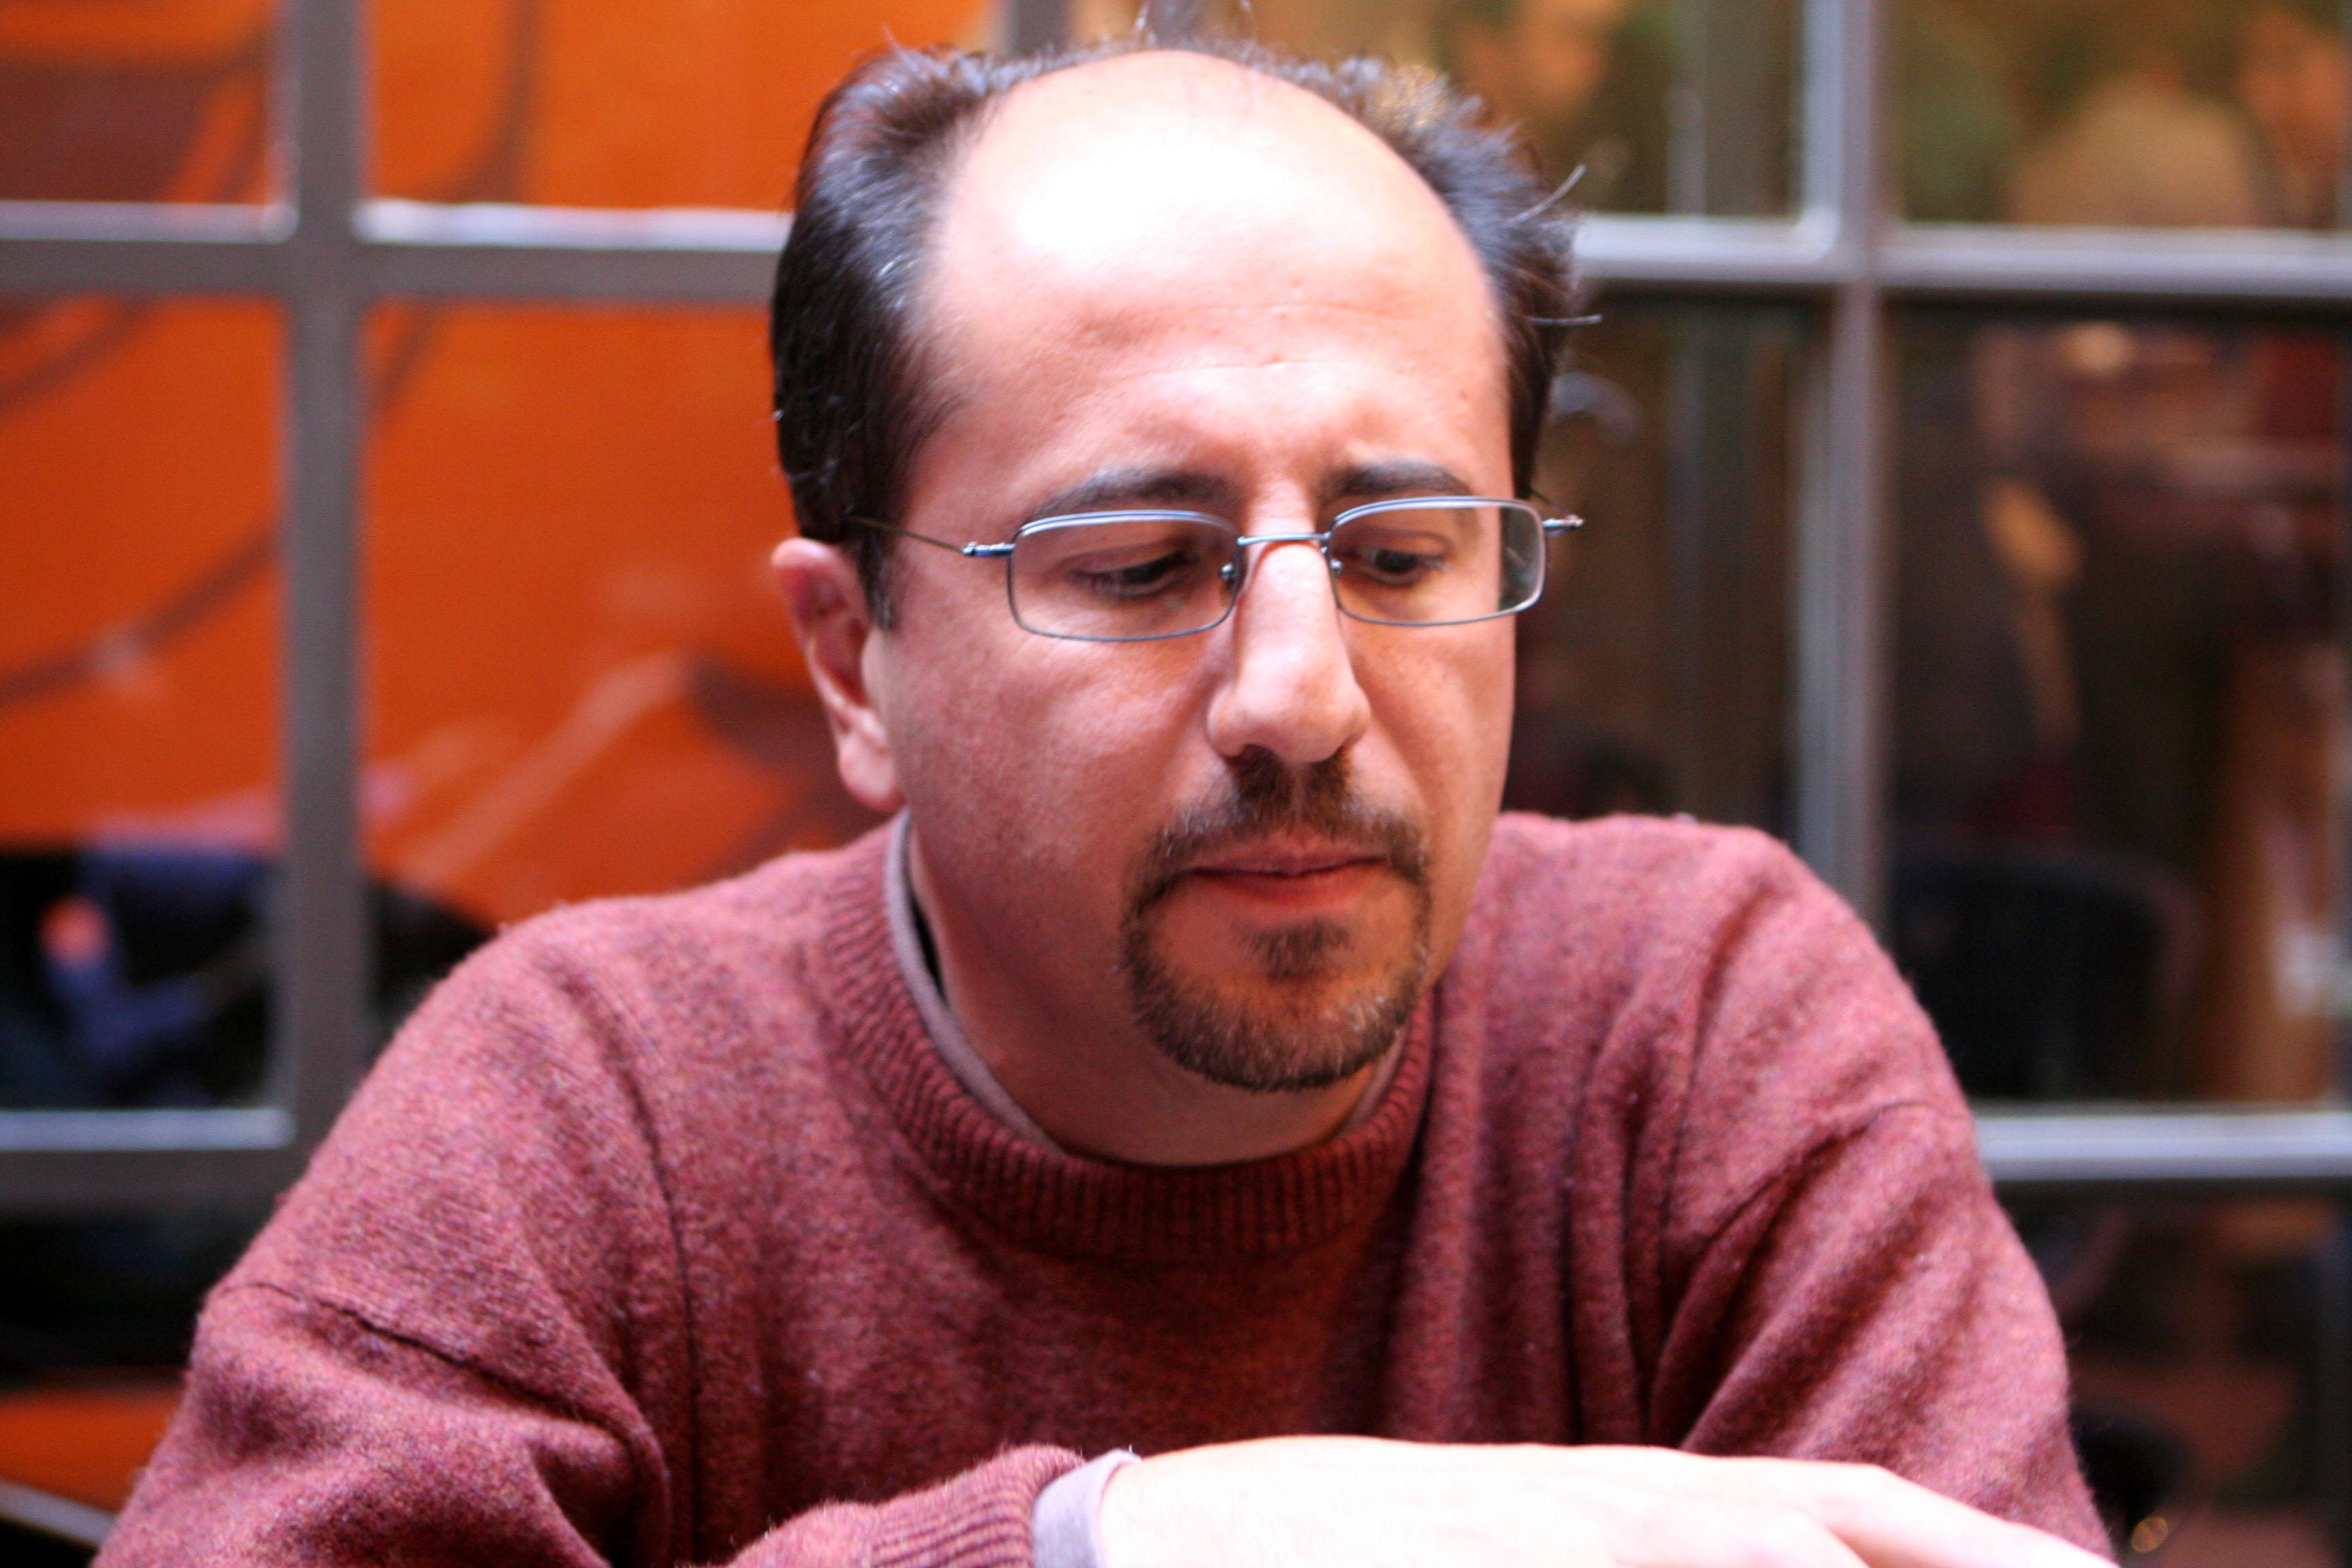 Jose Luis Orihuela